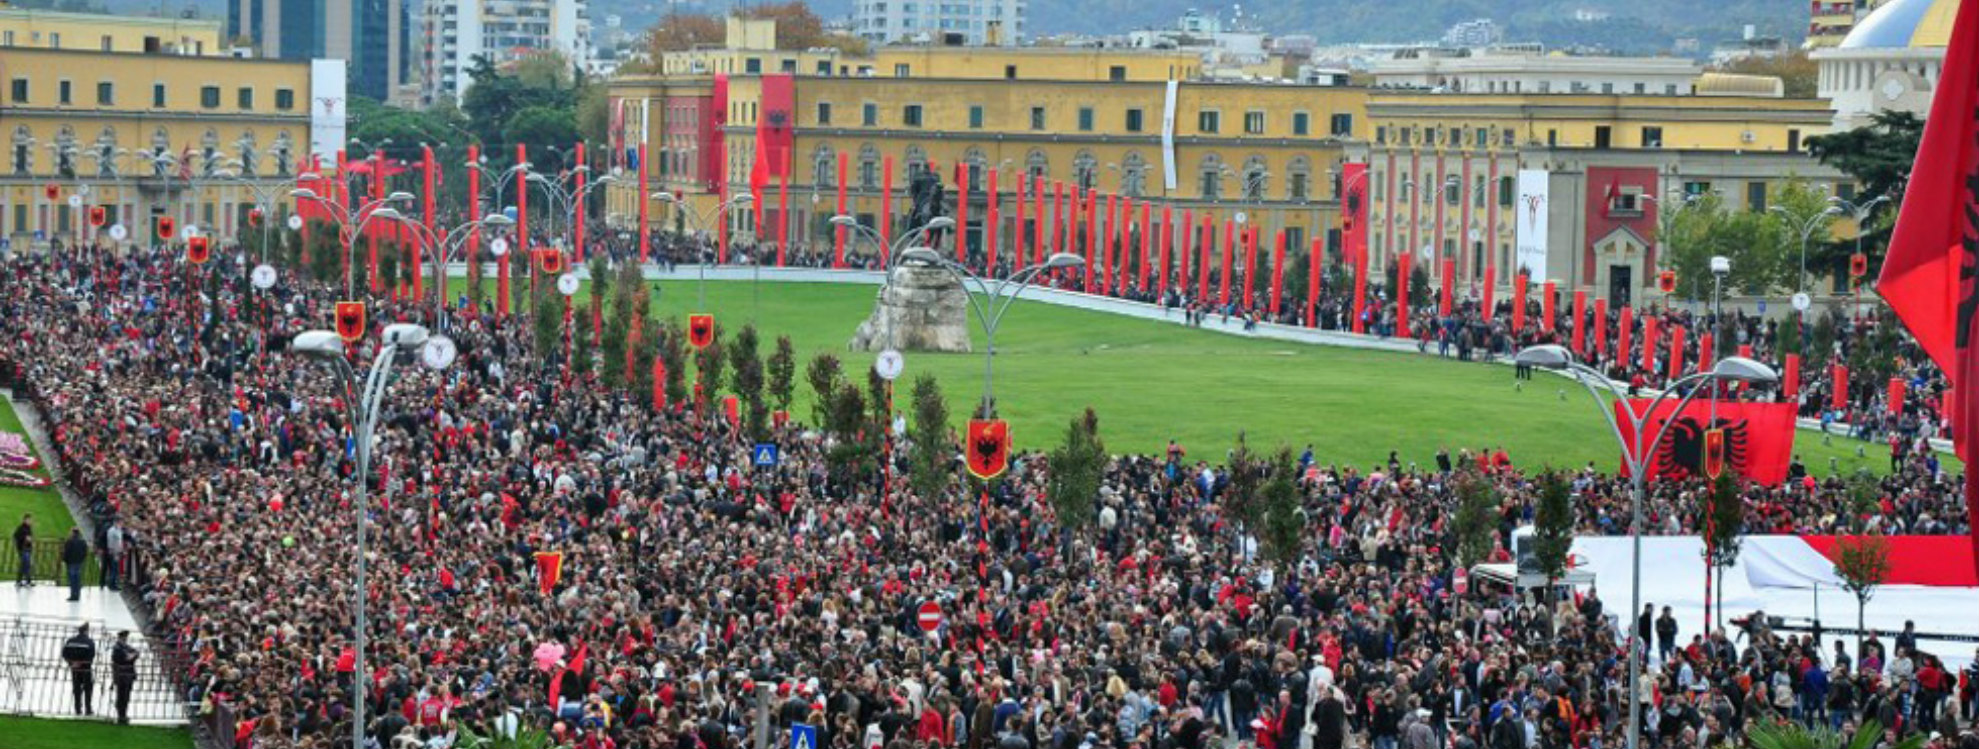 albania, indipendenza, eventrip